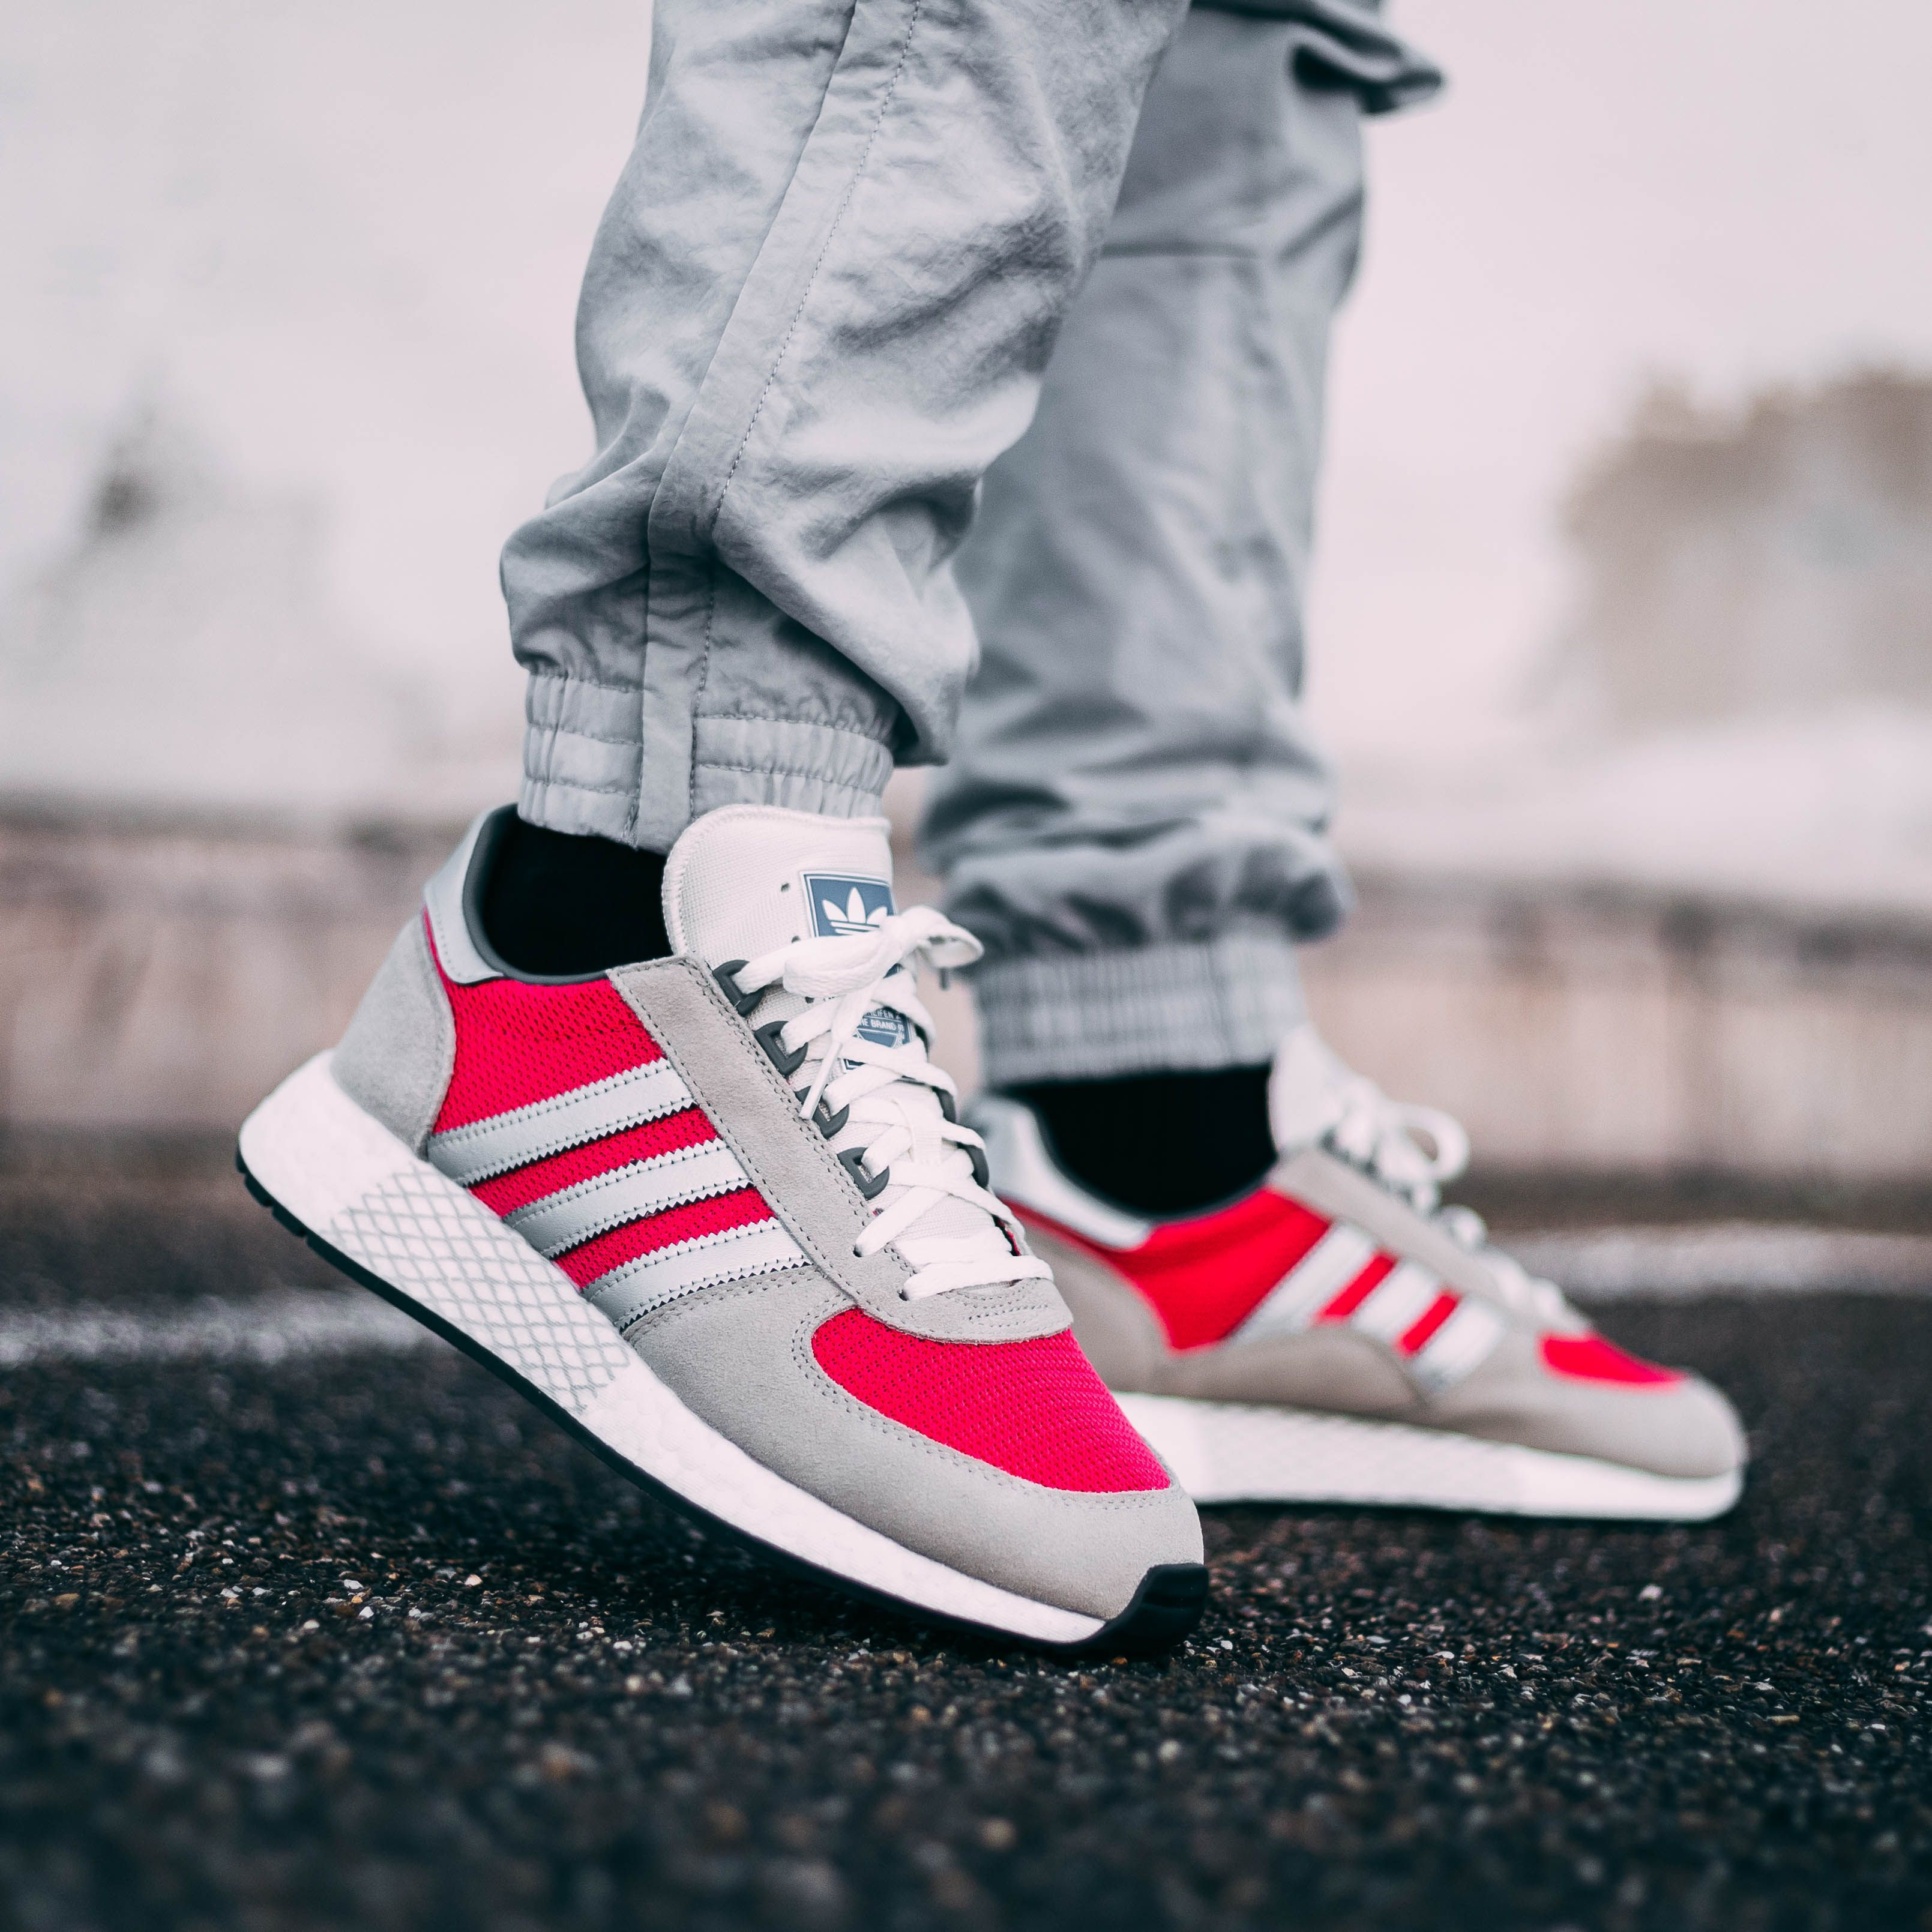 Adidas Originals Marathon Tech Real Magenta Turnschuhe Trends Sneakers Mode Adidas Originals